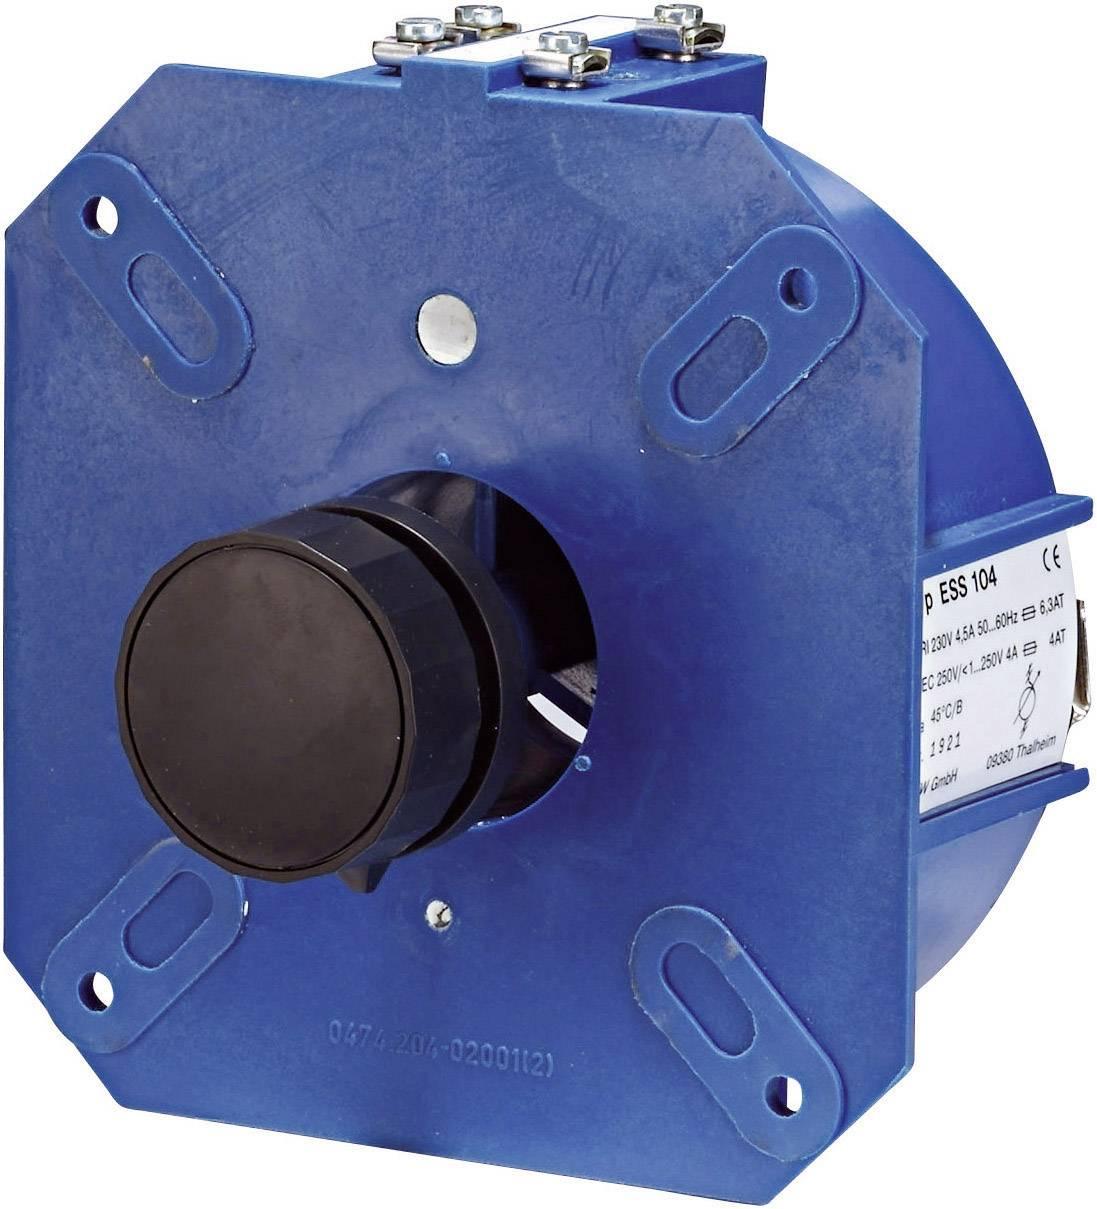 Regulačný transformátor Thalheimer ESS 102, 500 VA